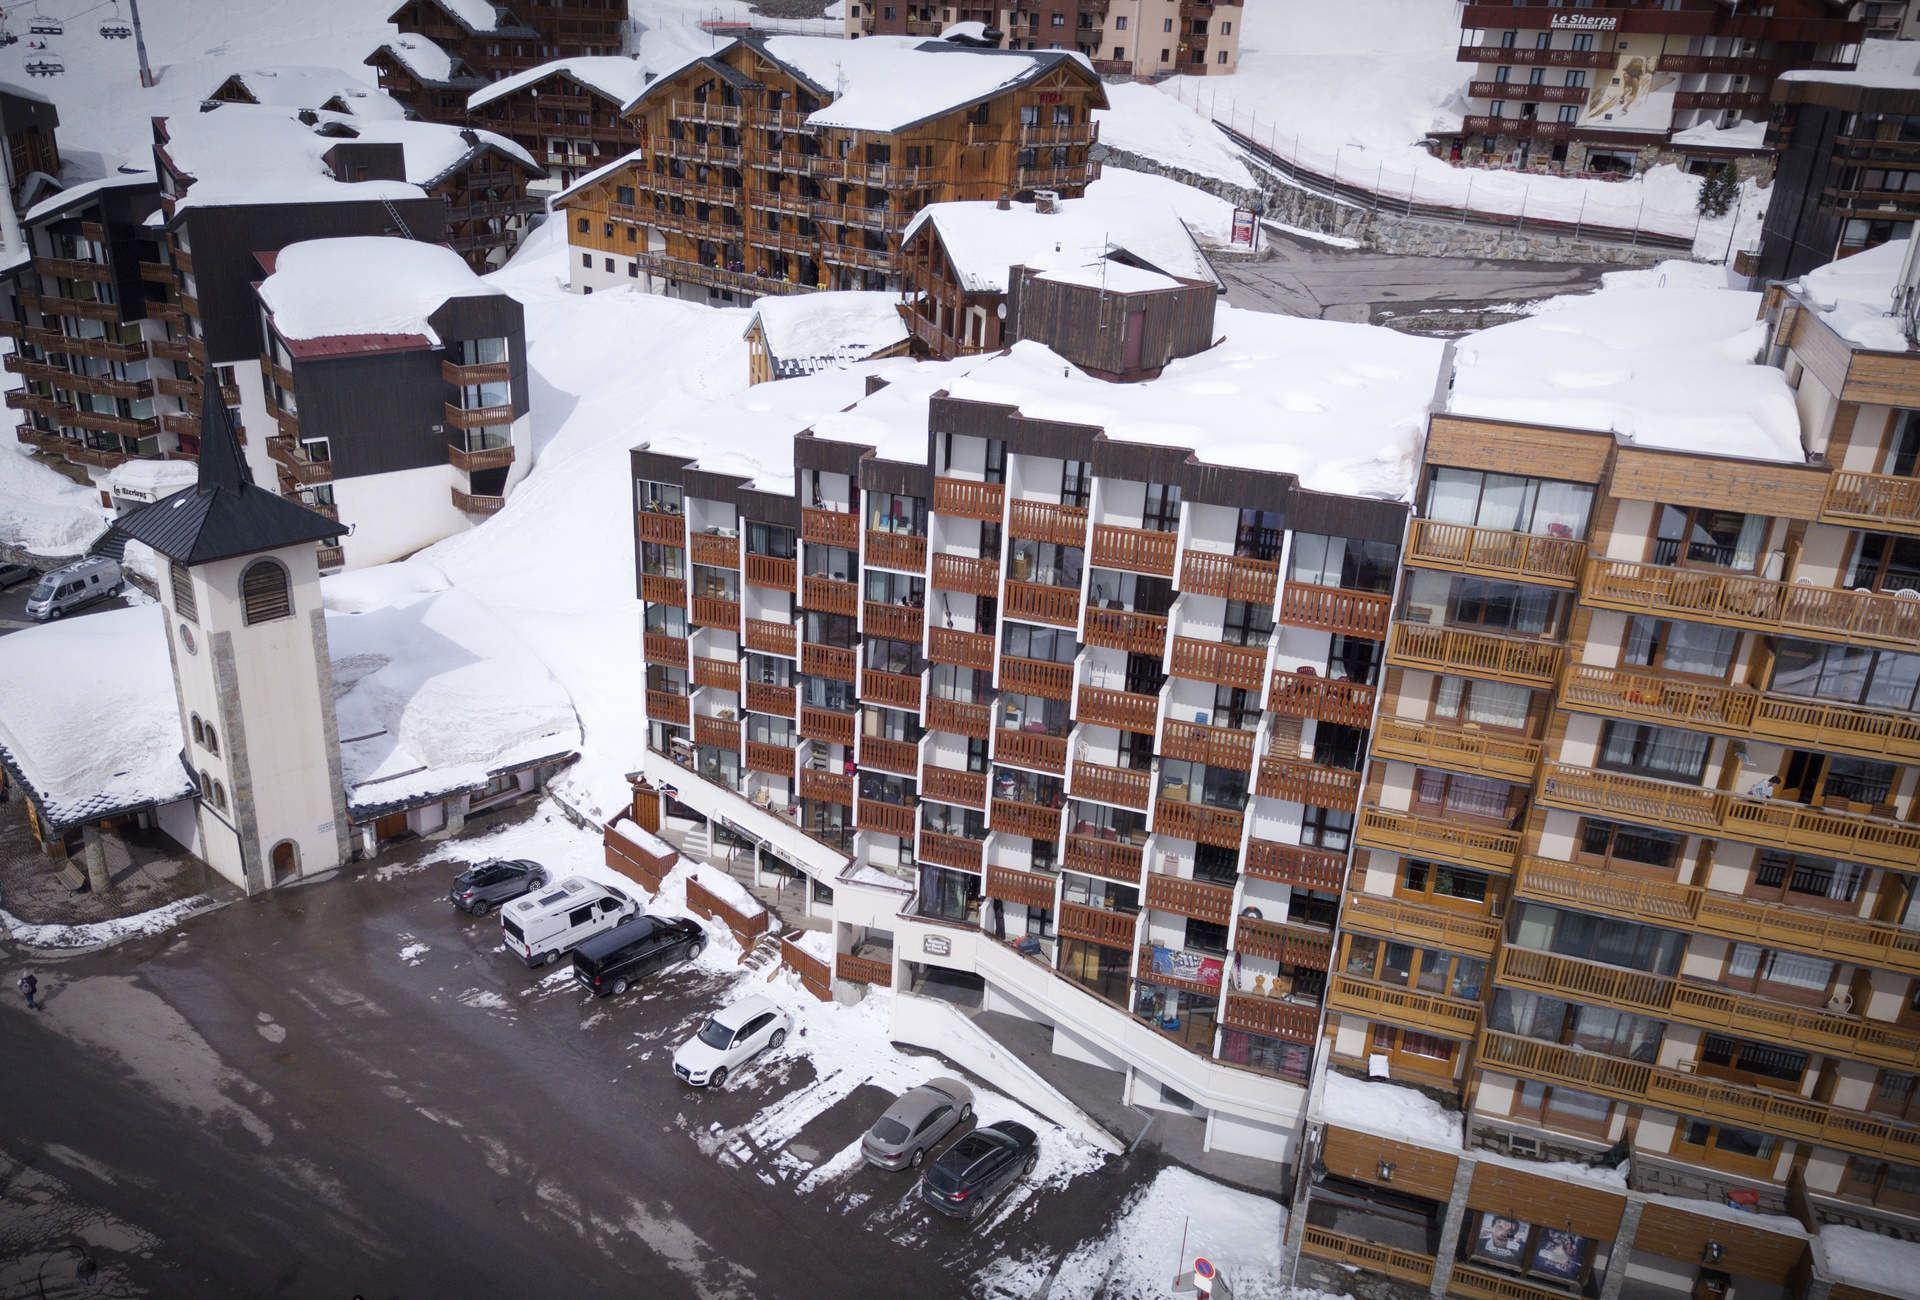 HAUTS DE VANOISE 408 / STUDIO 2 PERSONS - 2 SILVER SNOWFLAKES - VTI